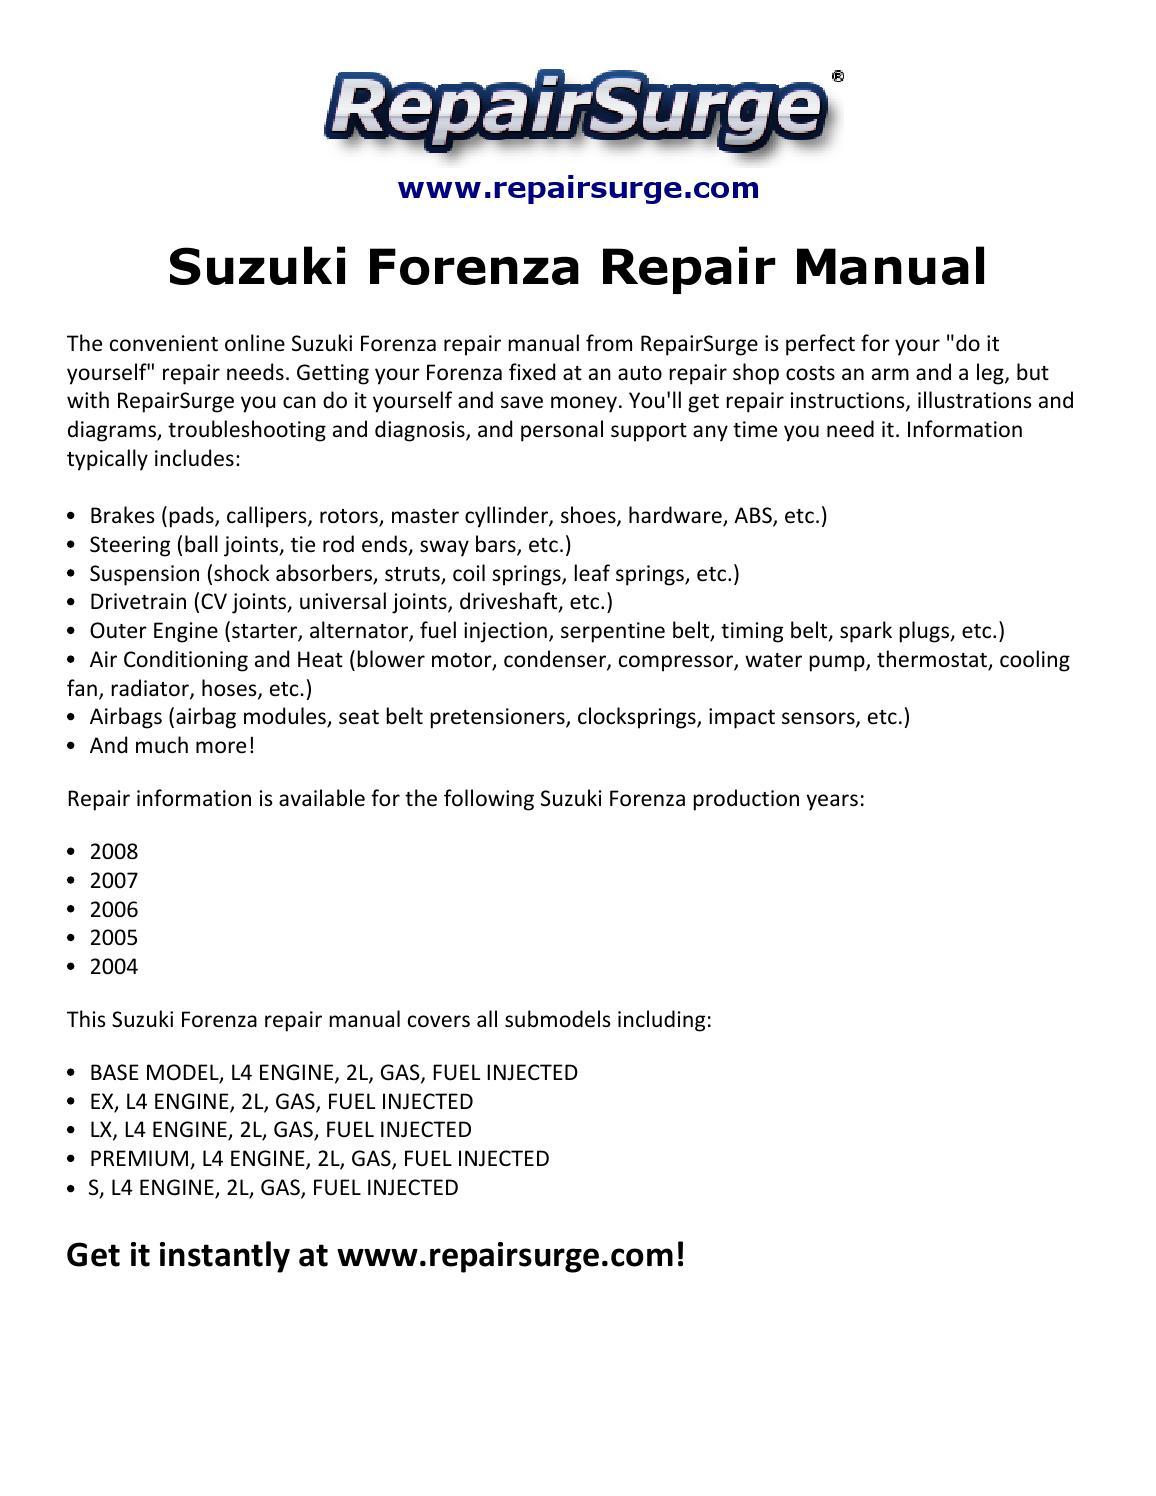 Suzuki Forenza Repair Manual 2004 2008 By Edward512 Issuu Engine Diagram